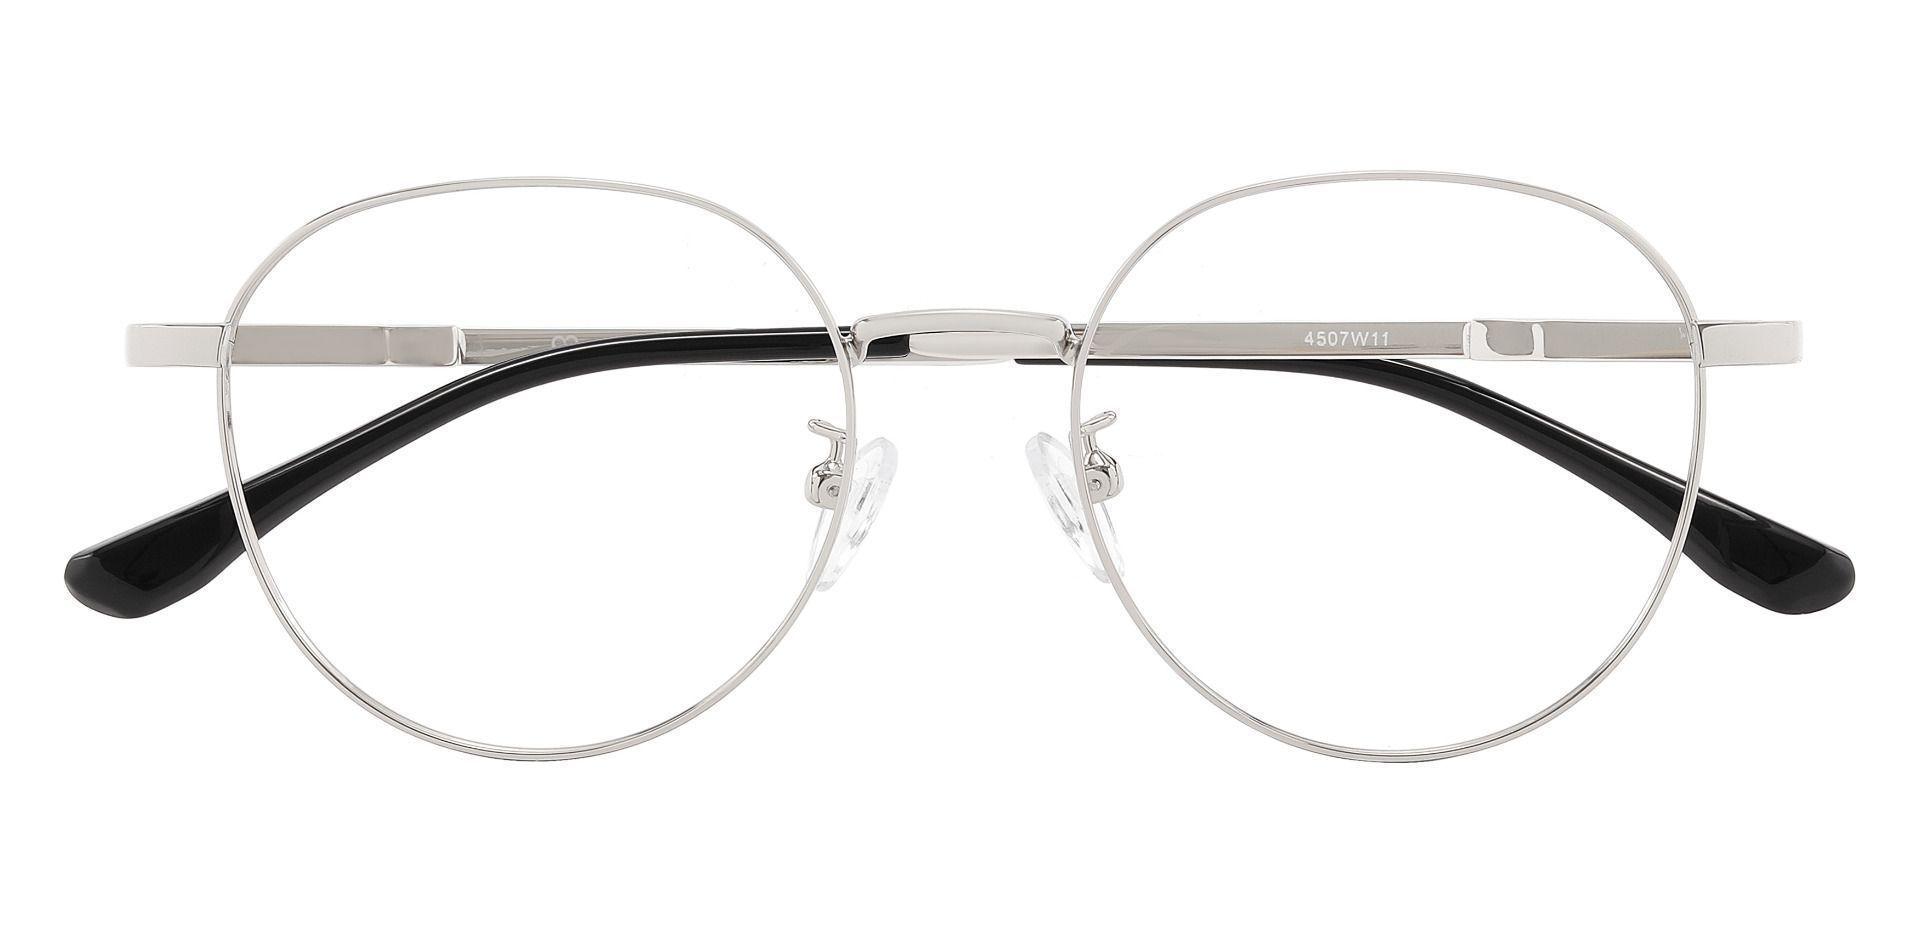 Melrose Oval Prescription Glasses - Silver